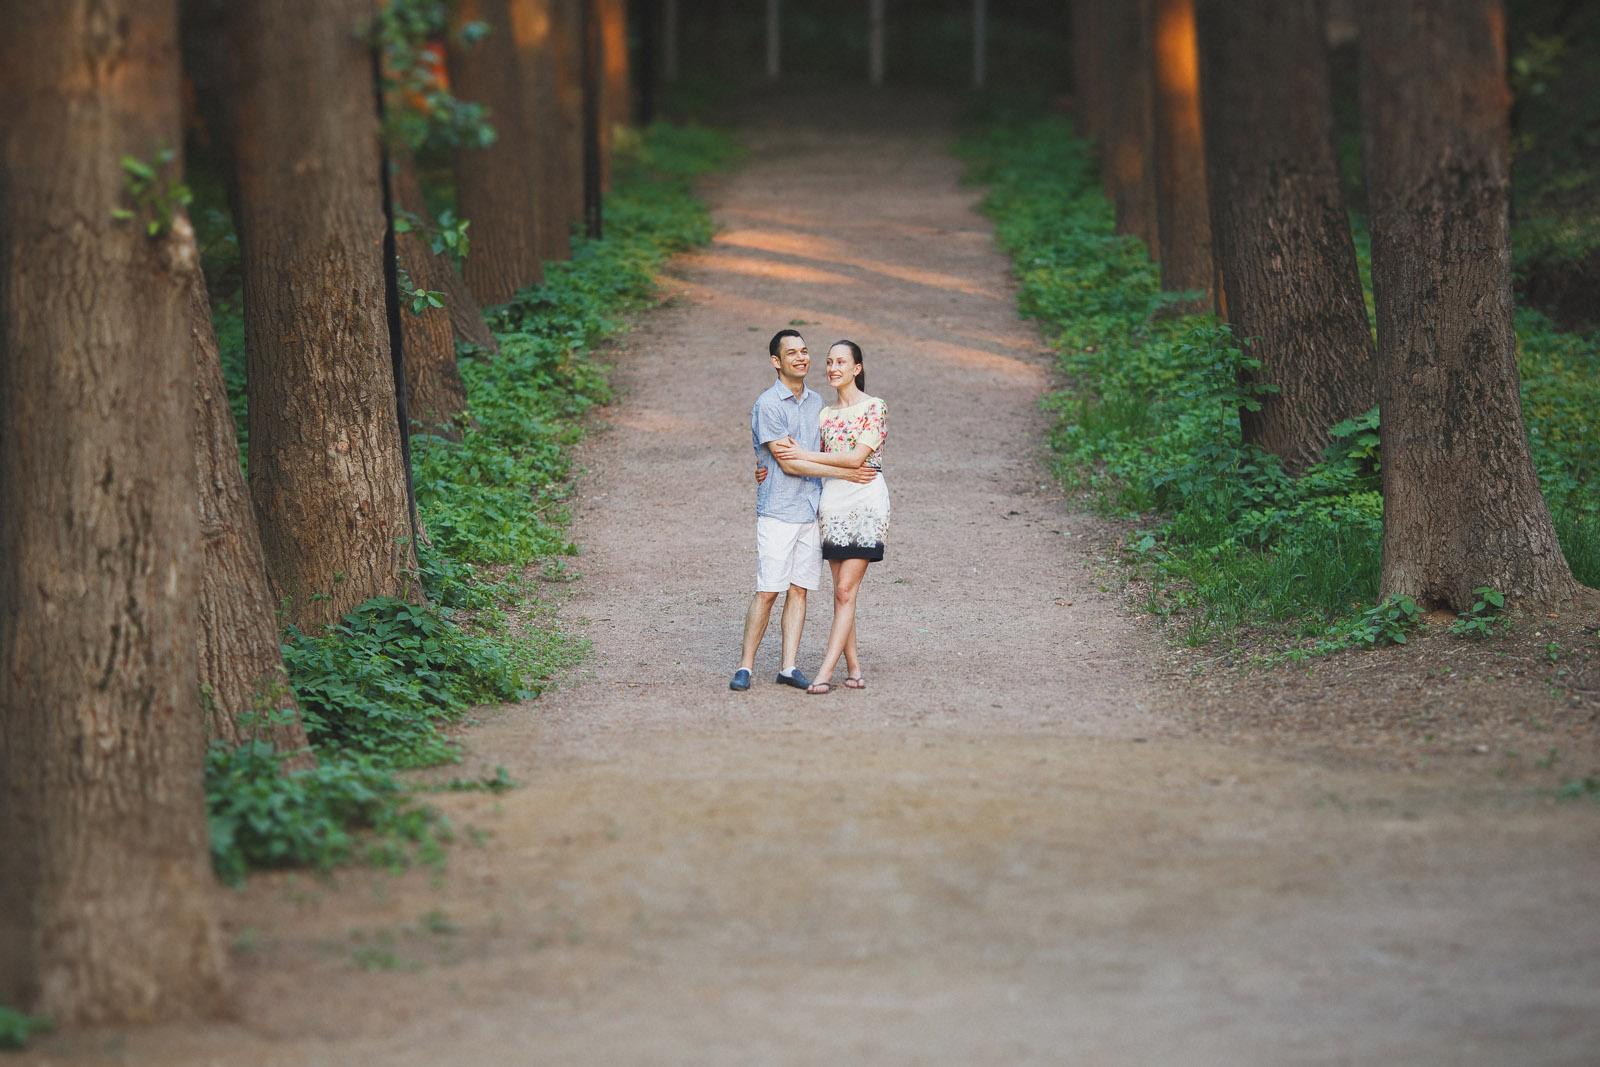 Фотосессия Love Story в Москве